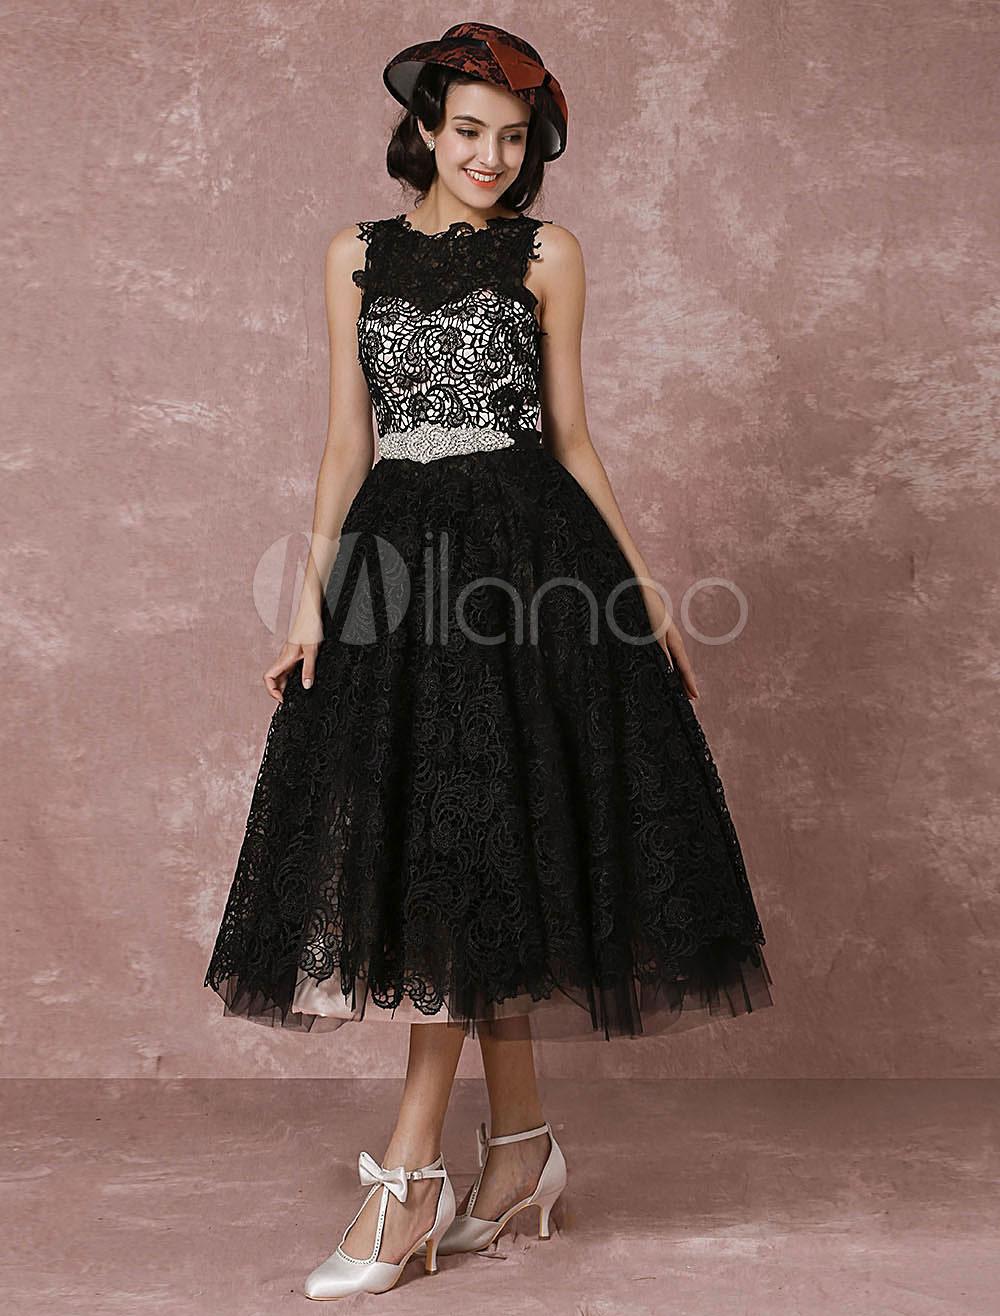 Short Wedding Dress Black Lace Vintage Bridal Gown Rhinestone Sash Tea-length Illusion Back Cocktail Dress Milanoo photo